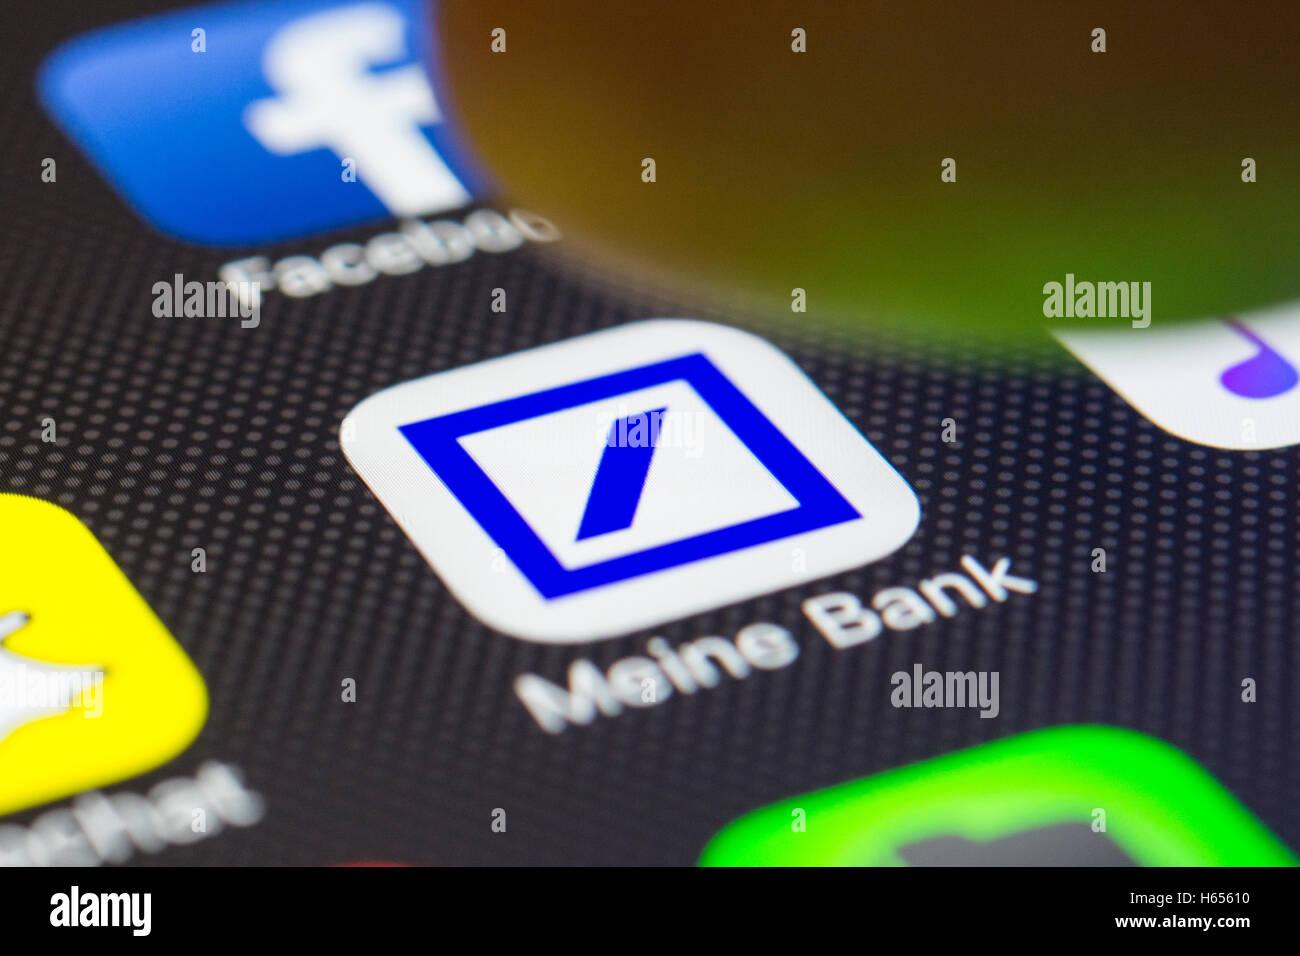 Deutsche Bank online-Banking-app auf dem iPhone Smartphone-Bildschirm hautnah Stockbild